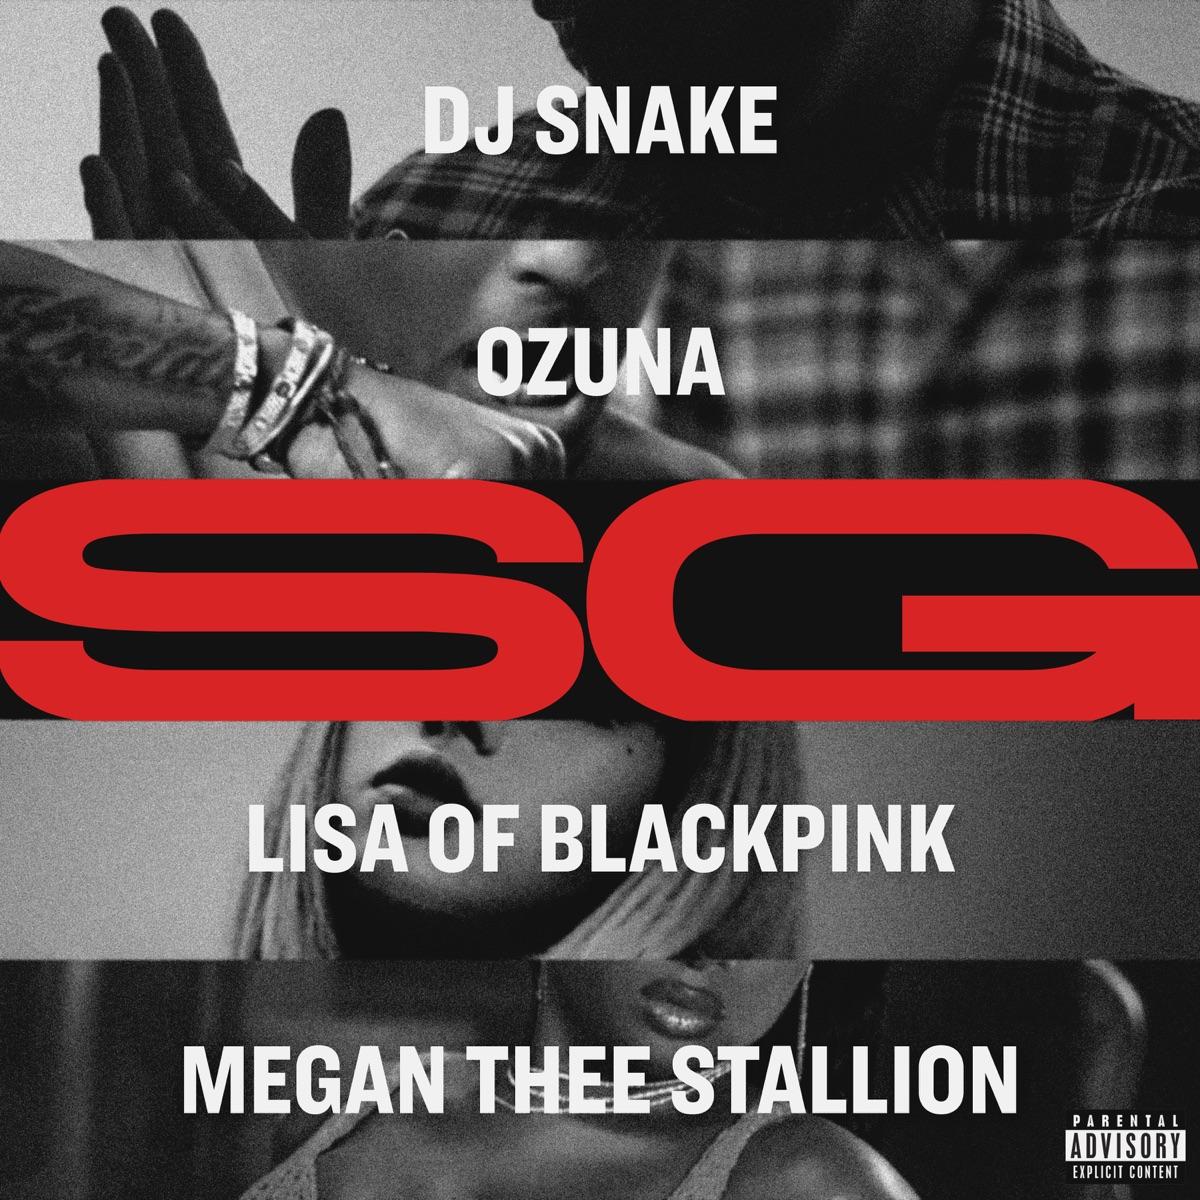 『DJ Snake, Ozuna, Megan Thee Stallion, LISA of BLACKPINK - SG』収録の『SG』ジャケット